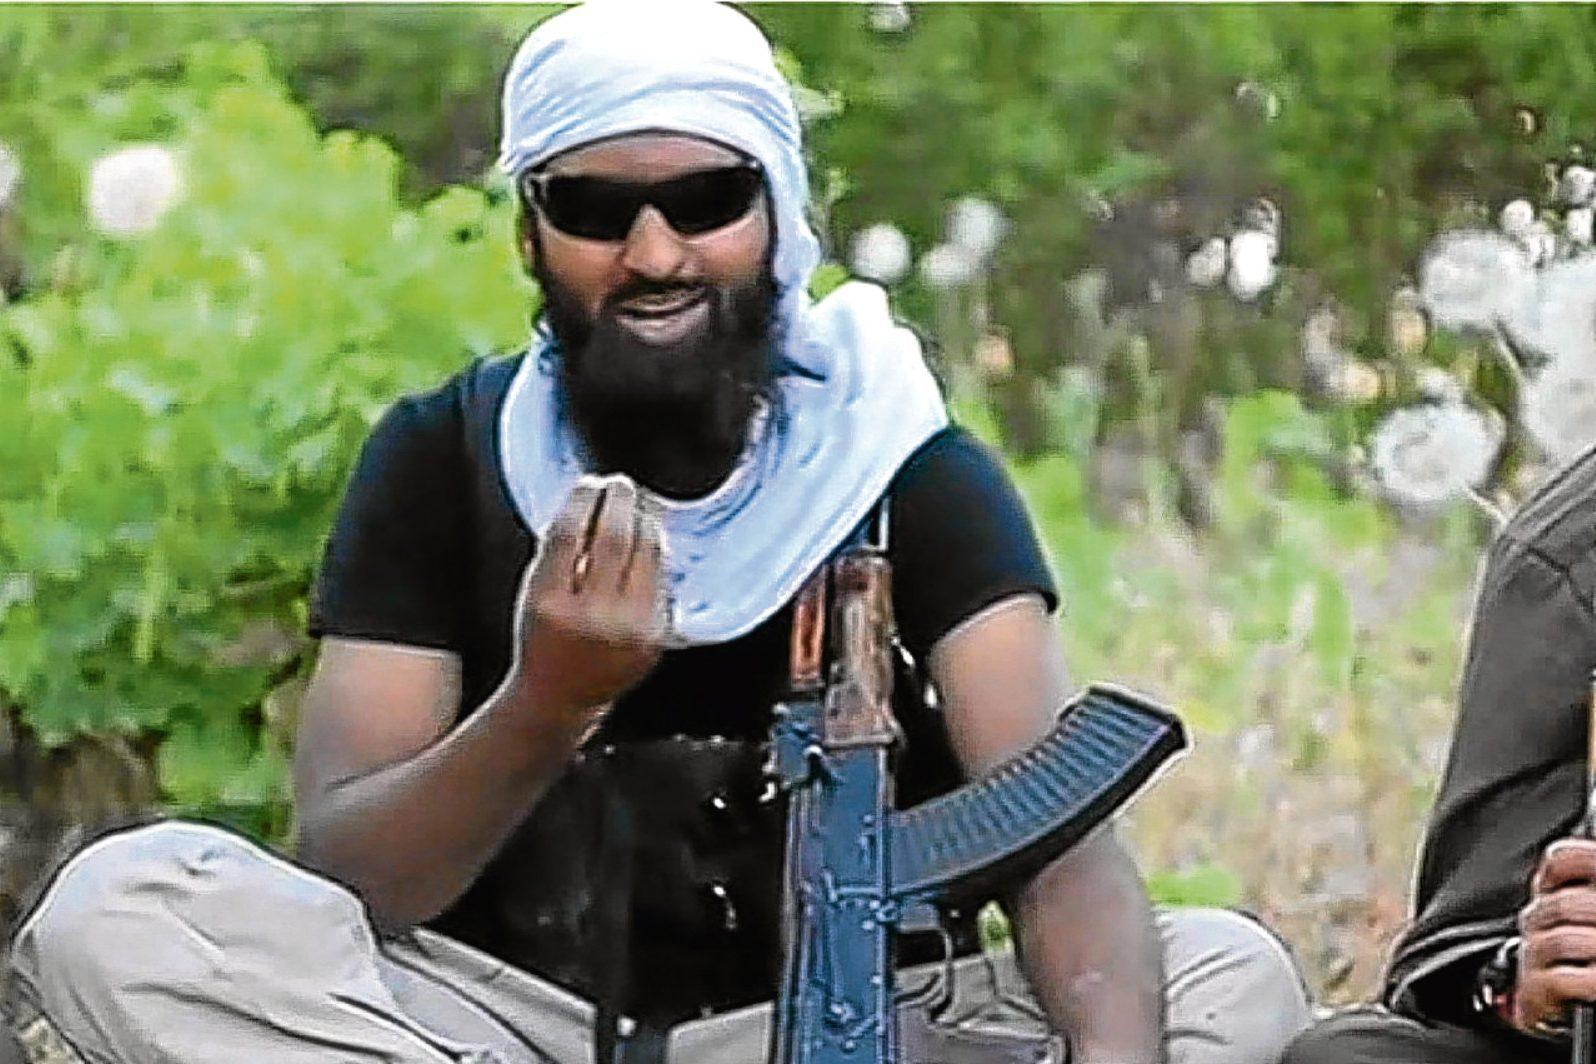 Isis Jihadi Ruhul Amin (aka Abdul Raqib Amin) grew up in Aberdeen before pursuing radicalism